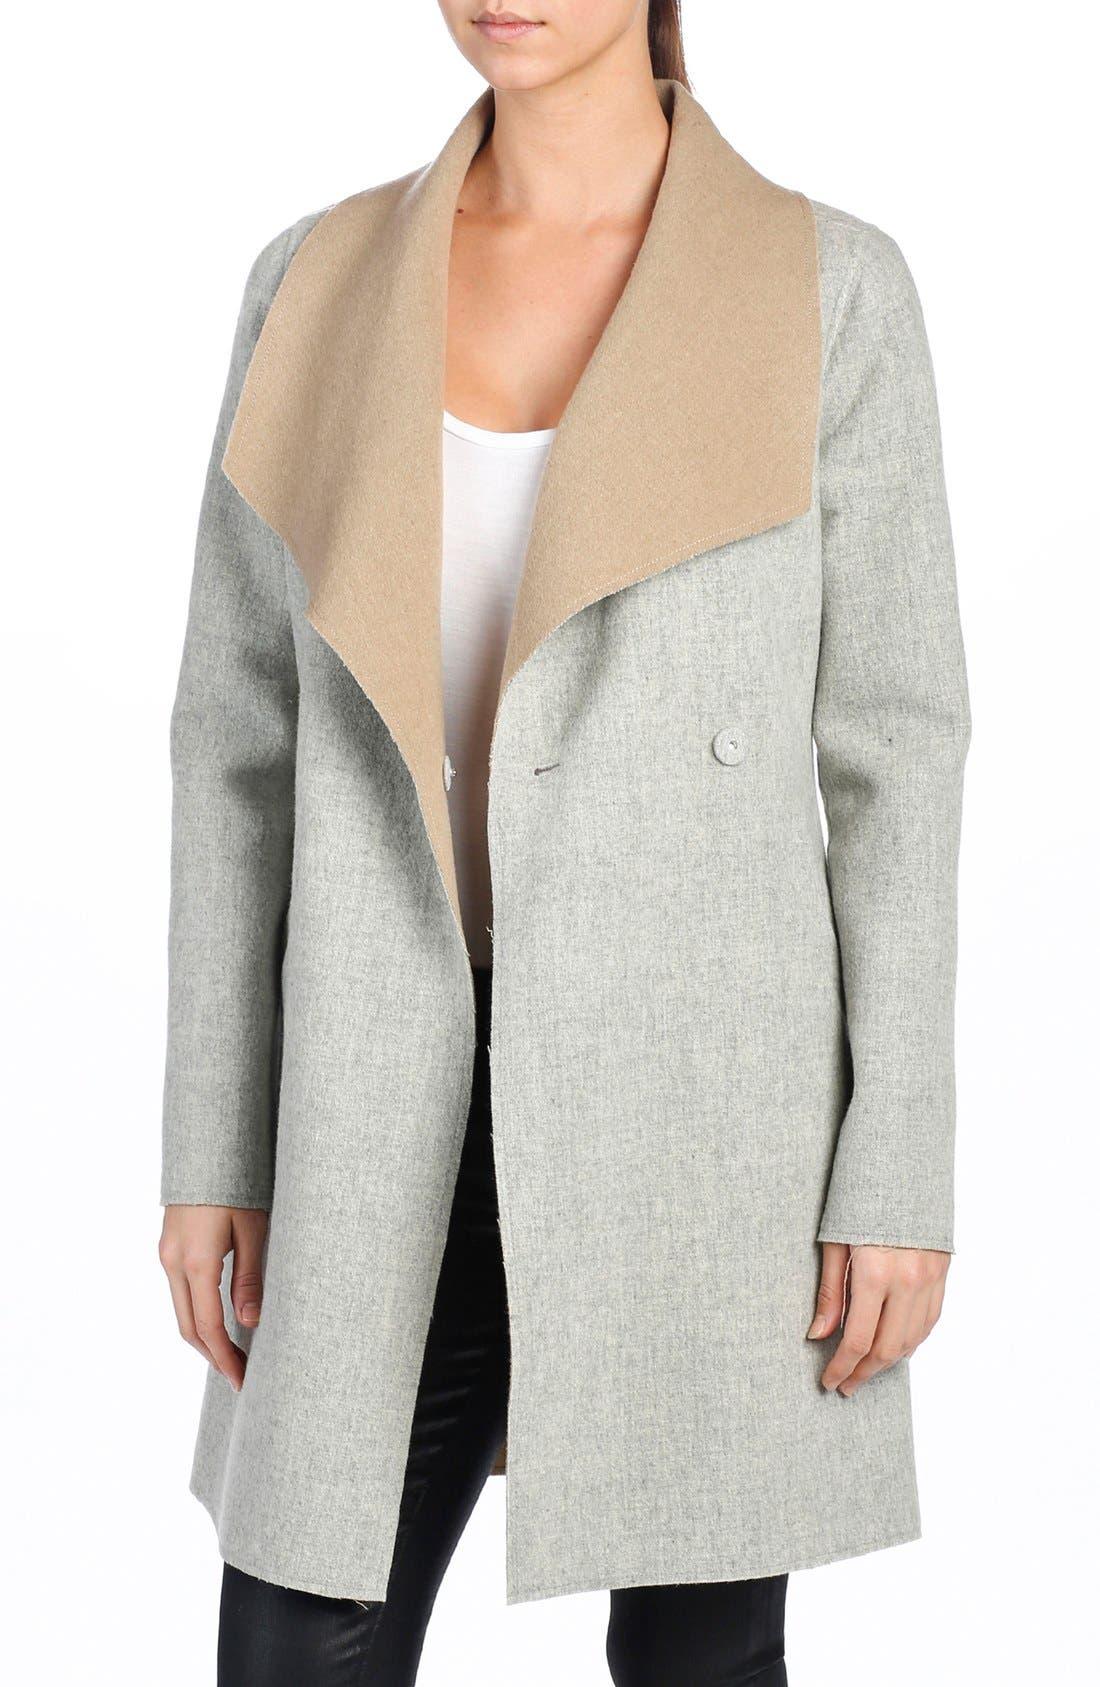 Main Image - PAIGE 'Lily' Drape Collar Wool Blend Coat